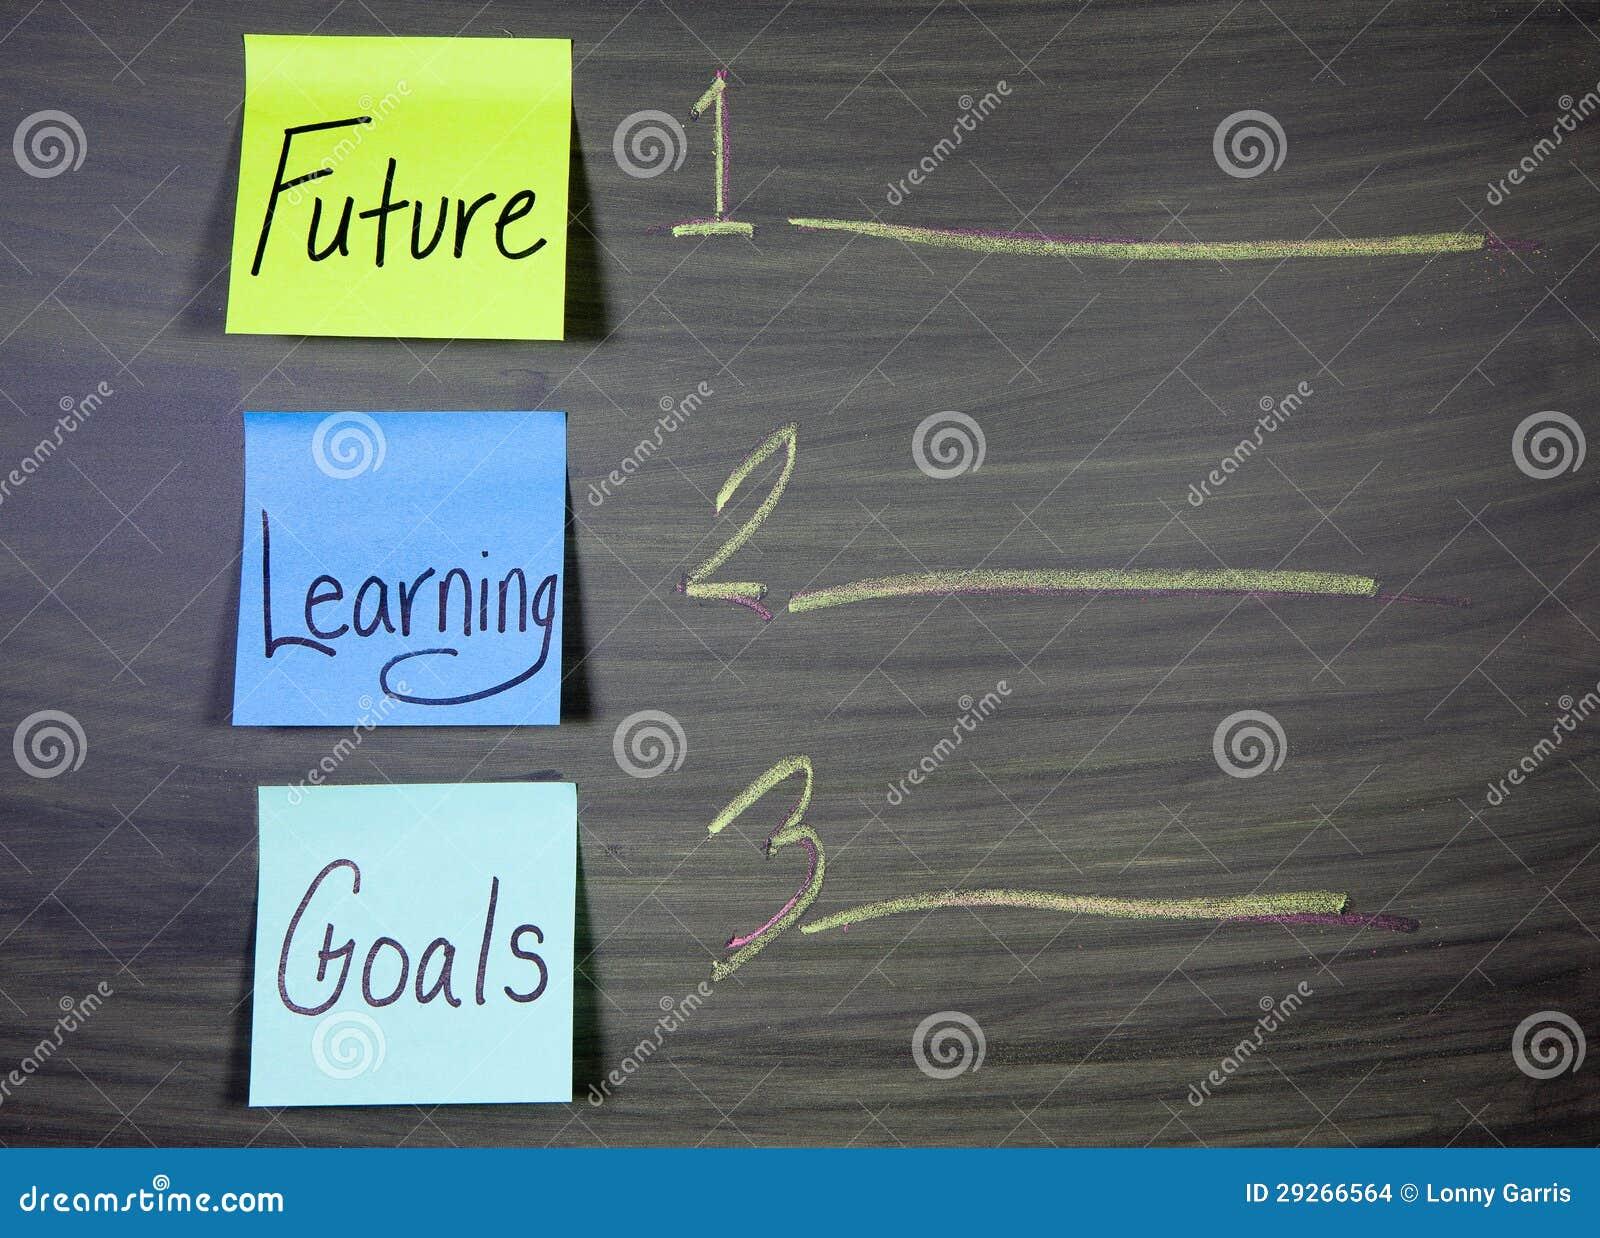 scholarship essays about future goals